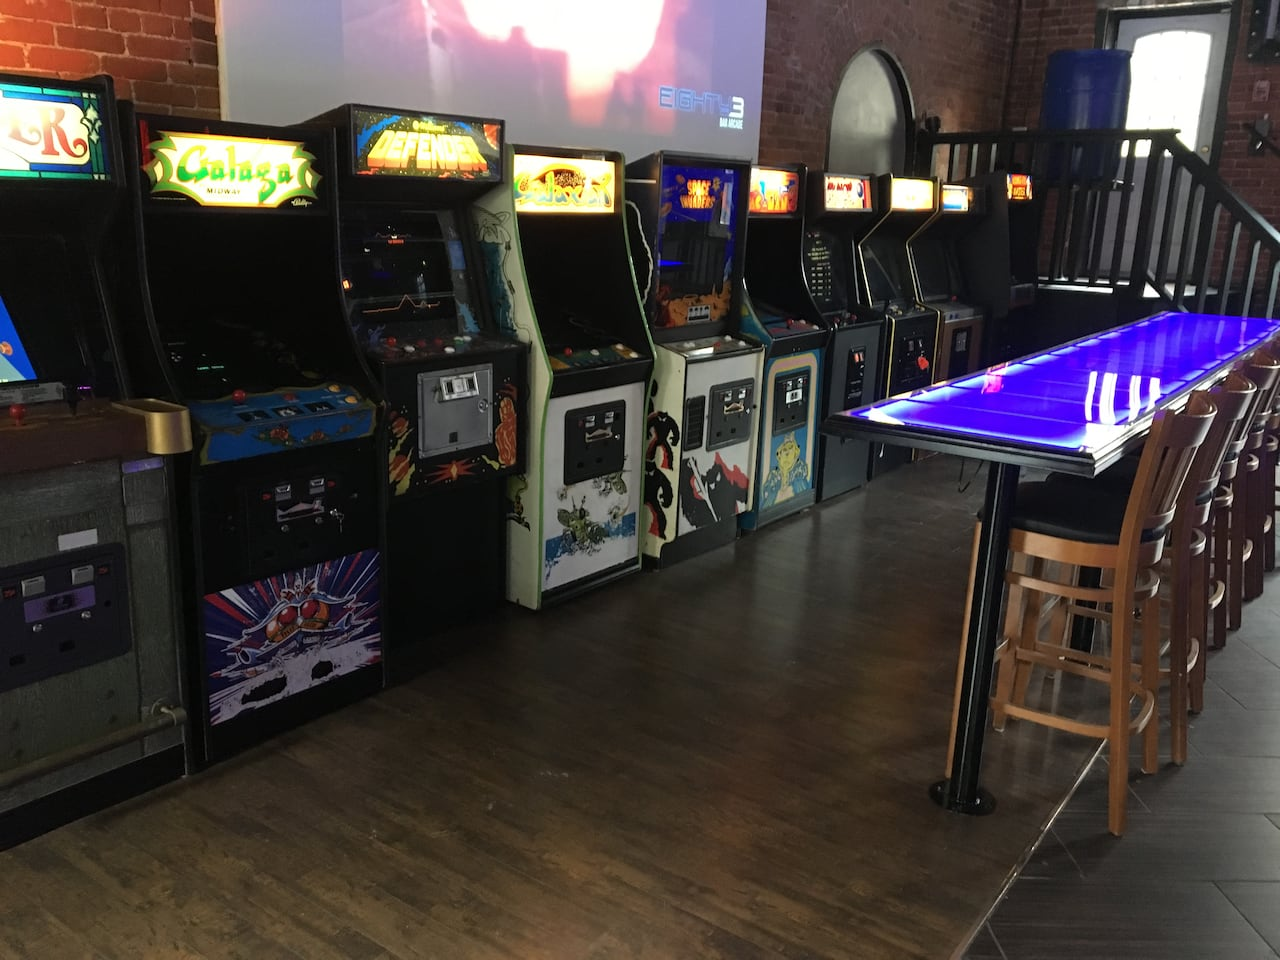 Entrepreneur says retro laws keep retro arcades from succeeding in